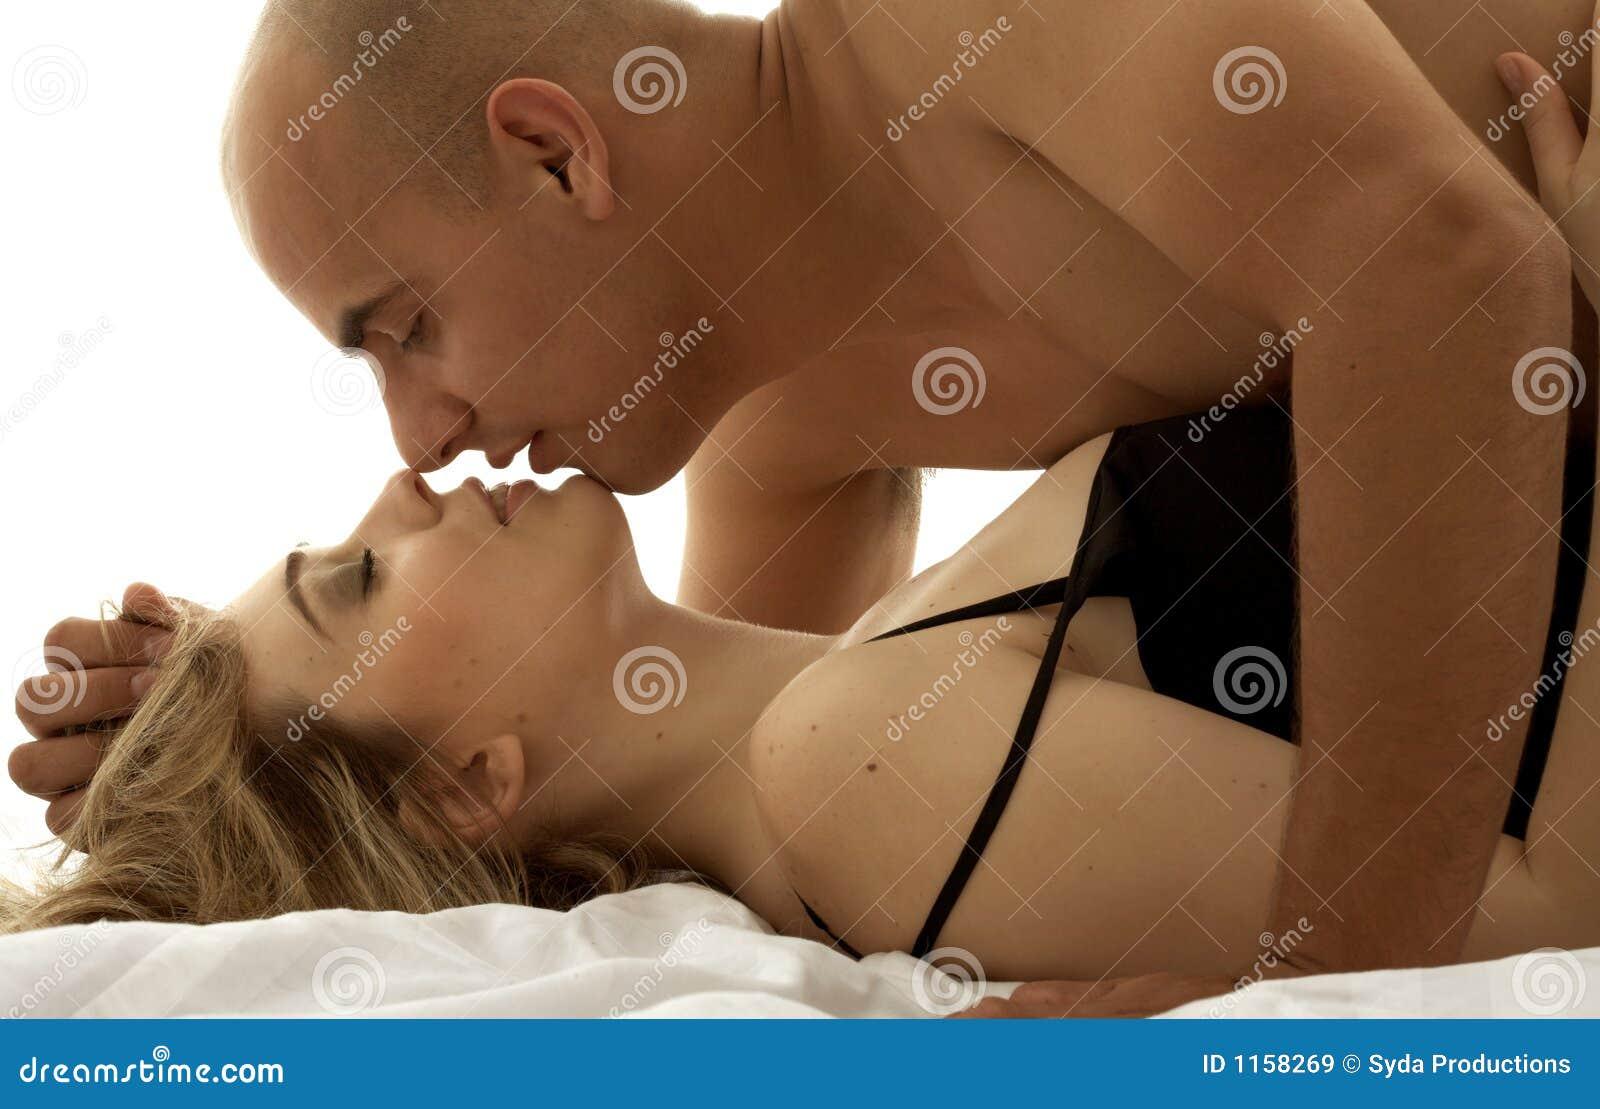 Фото як займаються сексом 18 фотография